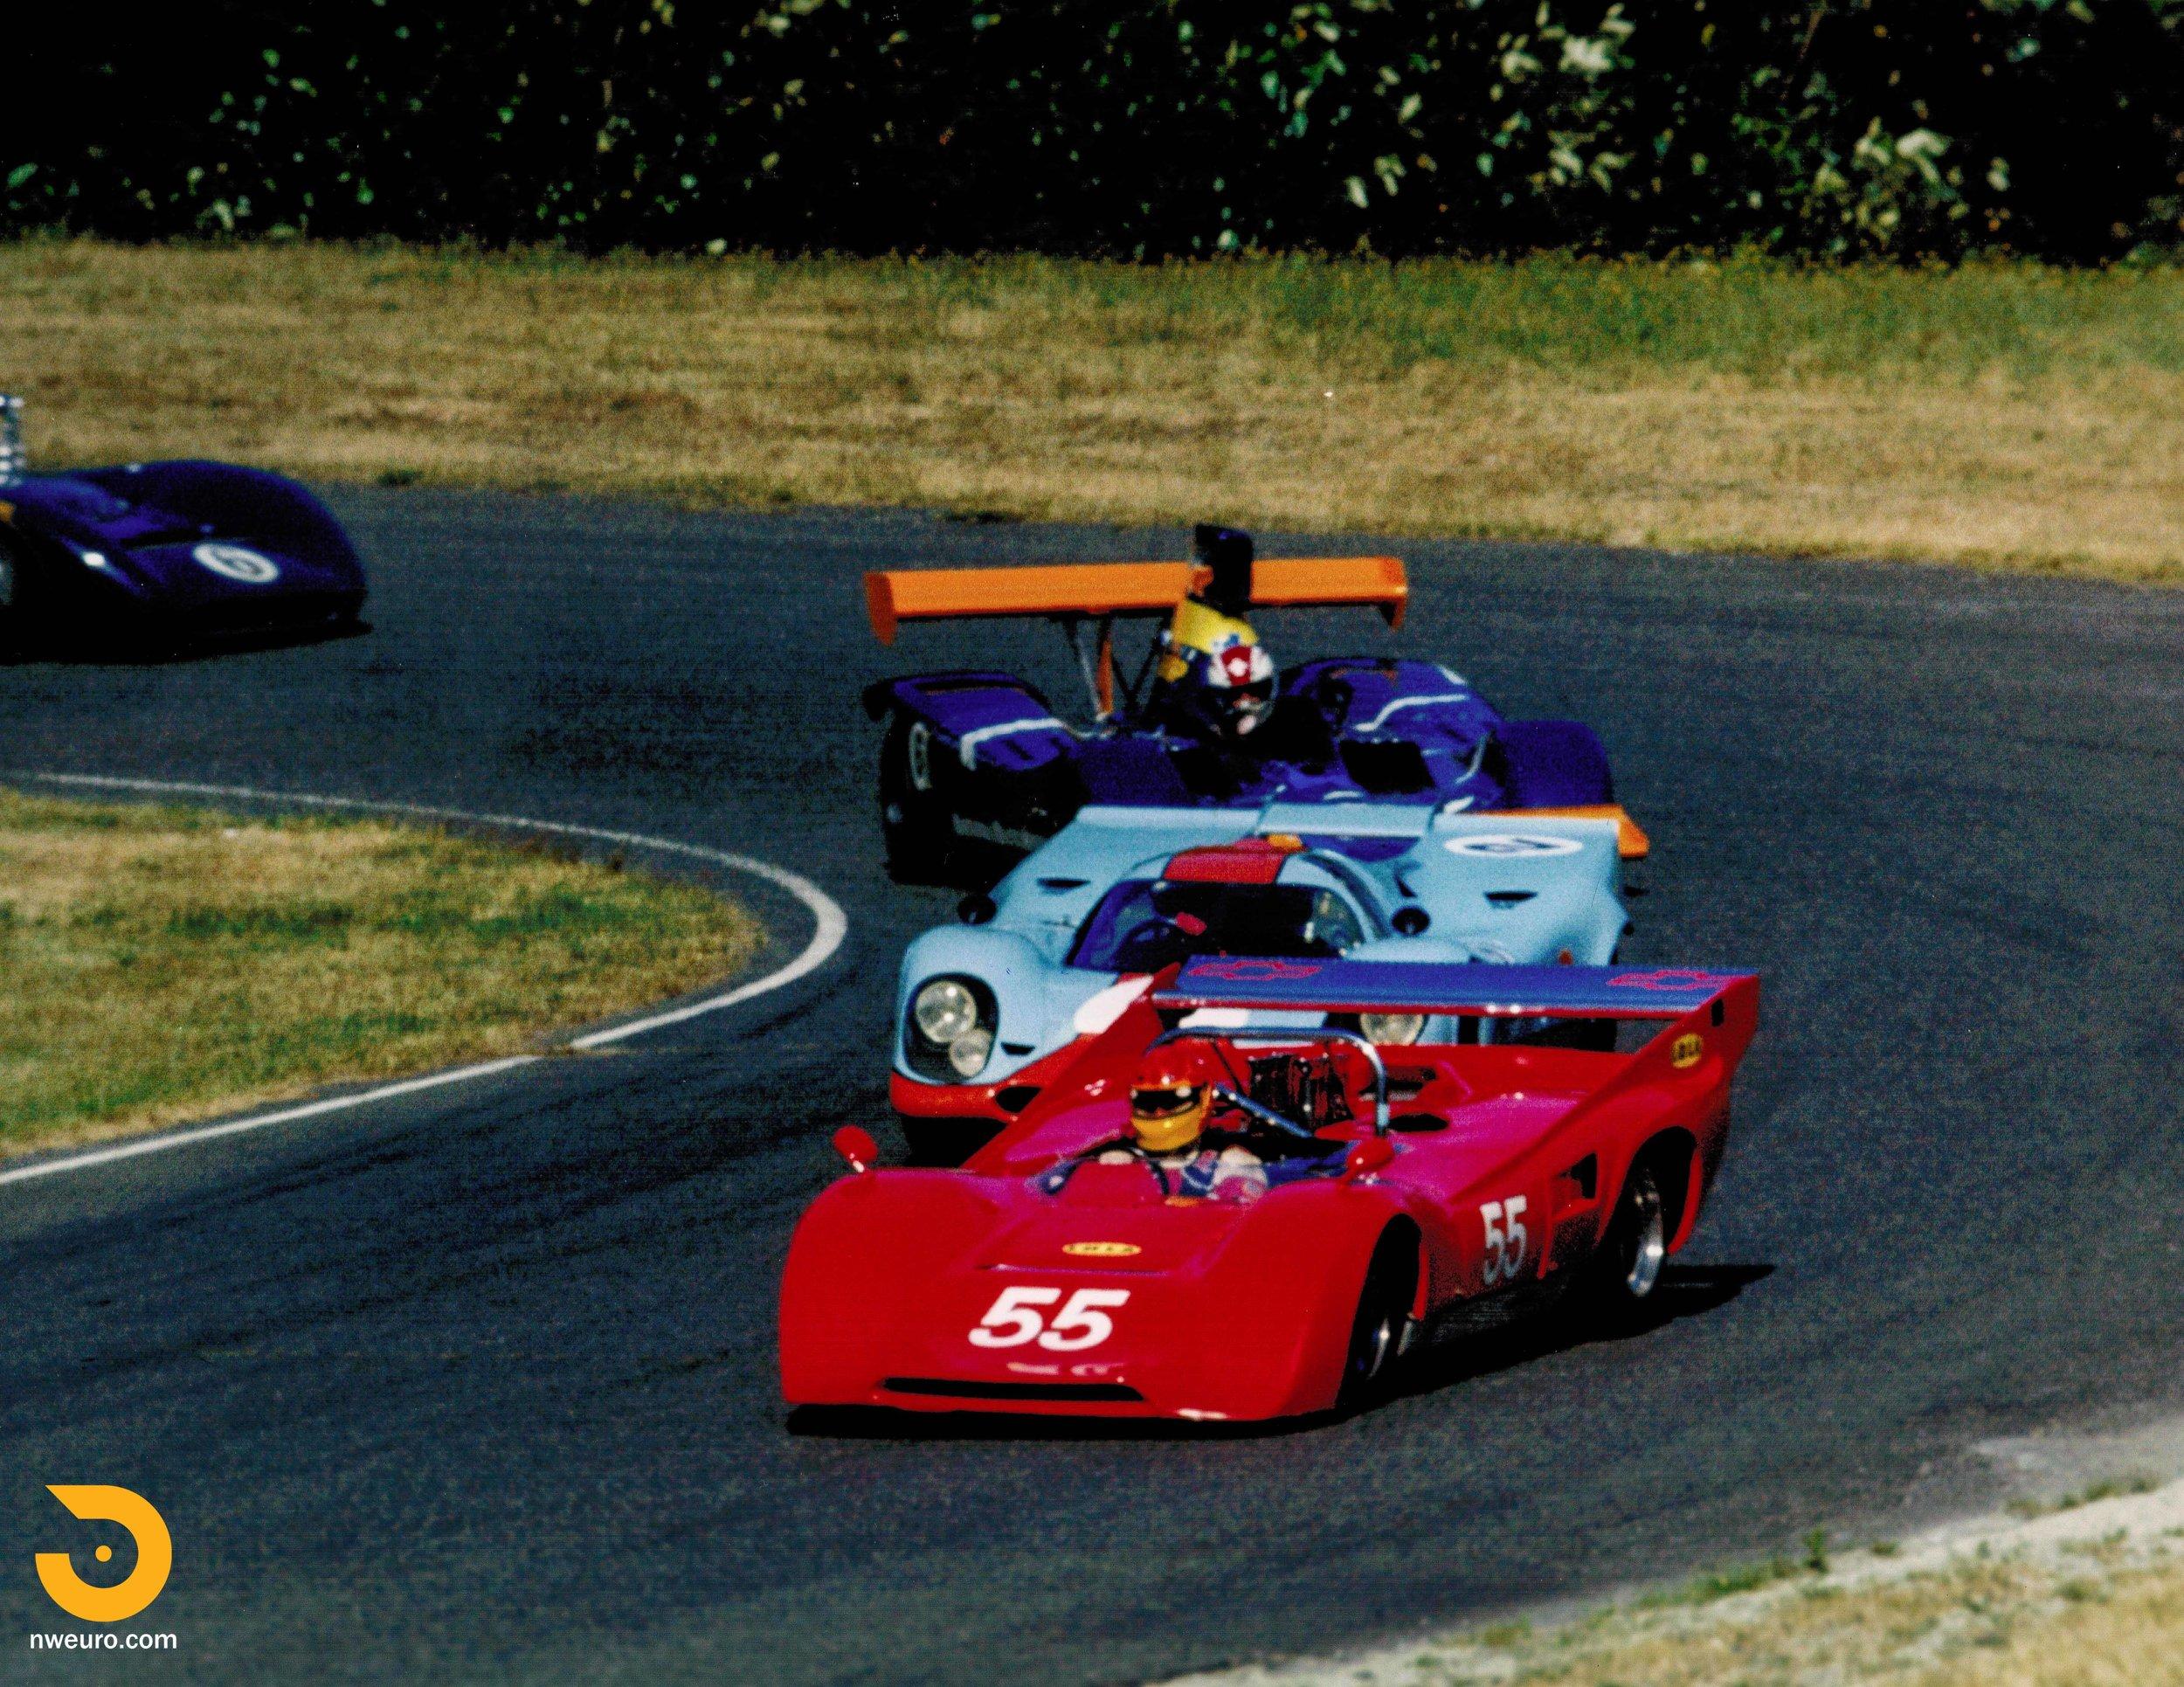 1969 Lola T162 Can-Am Race Car Action Shots-13.jpg